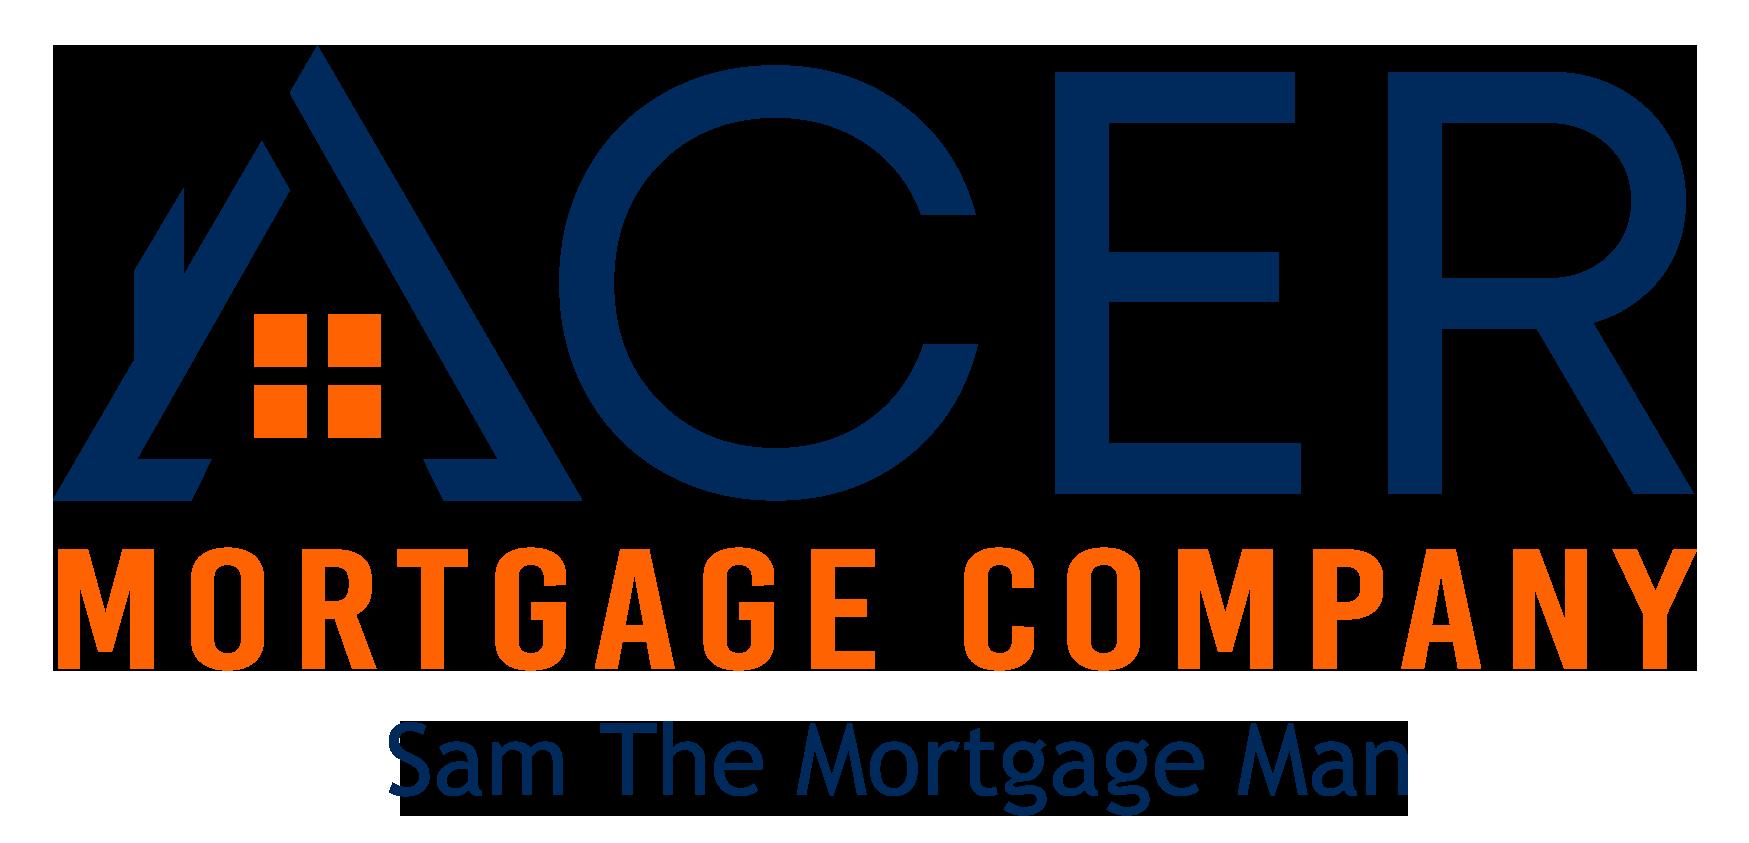 Acer Mortgage Company logo